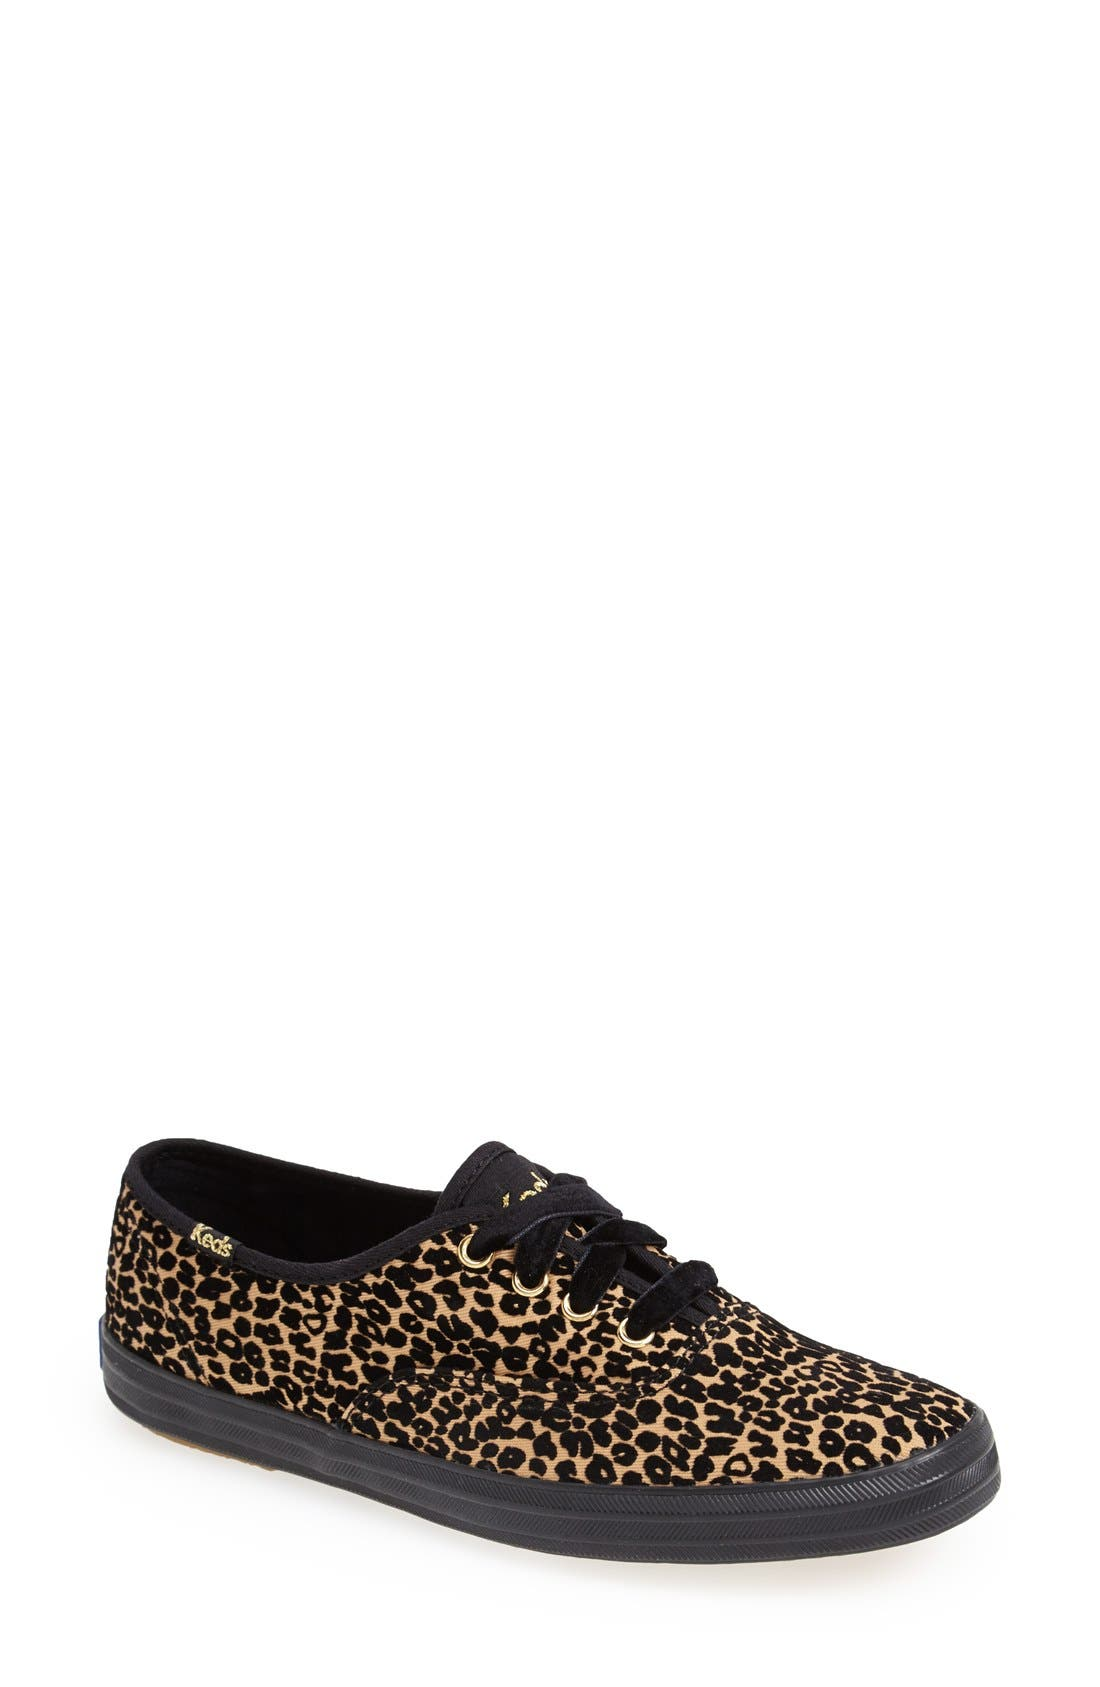 Main Image - Keds® 'Champion - Leopard Spot' Sneaker (Women)